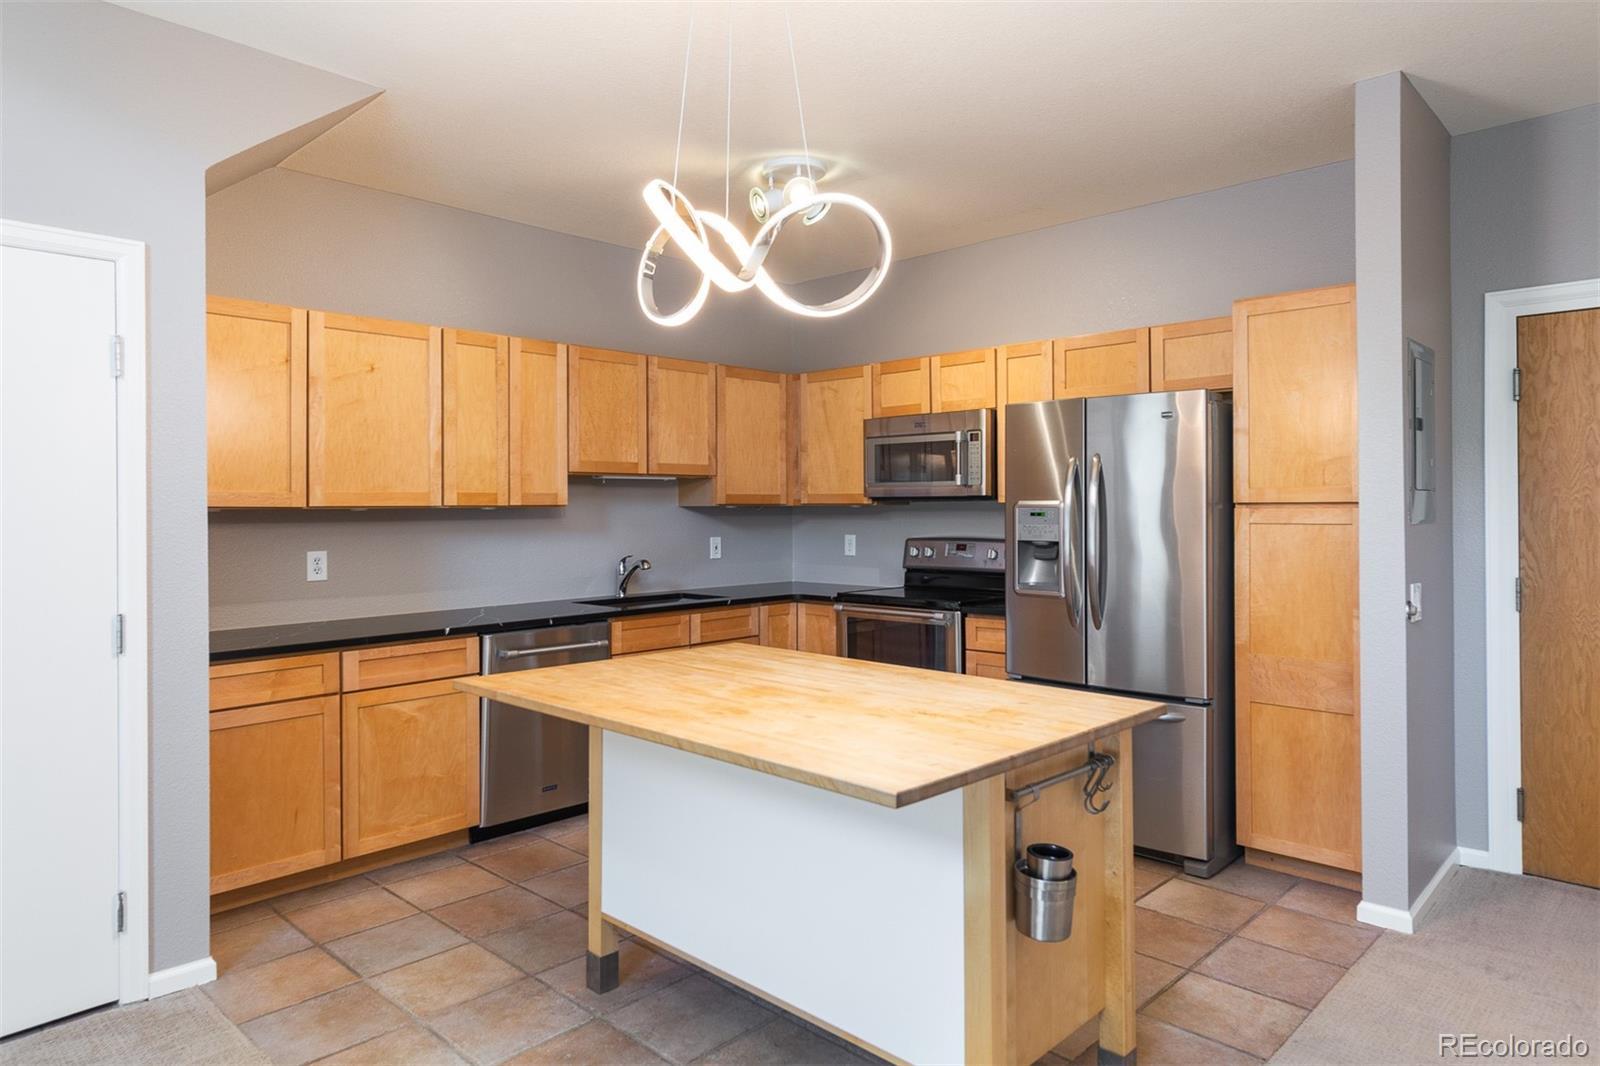 MLS# 3580407 - 15 - 837 E 17th Avenue #3J, Denver, CO 80218